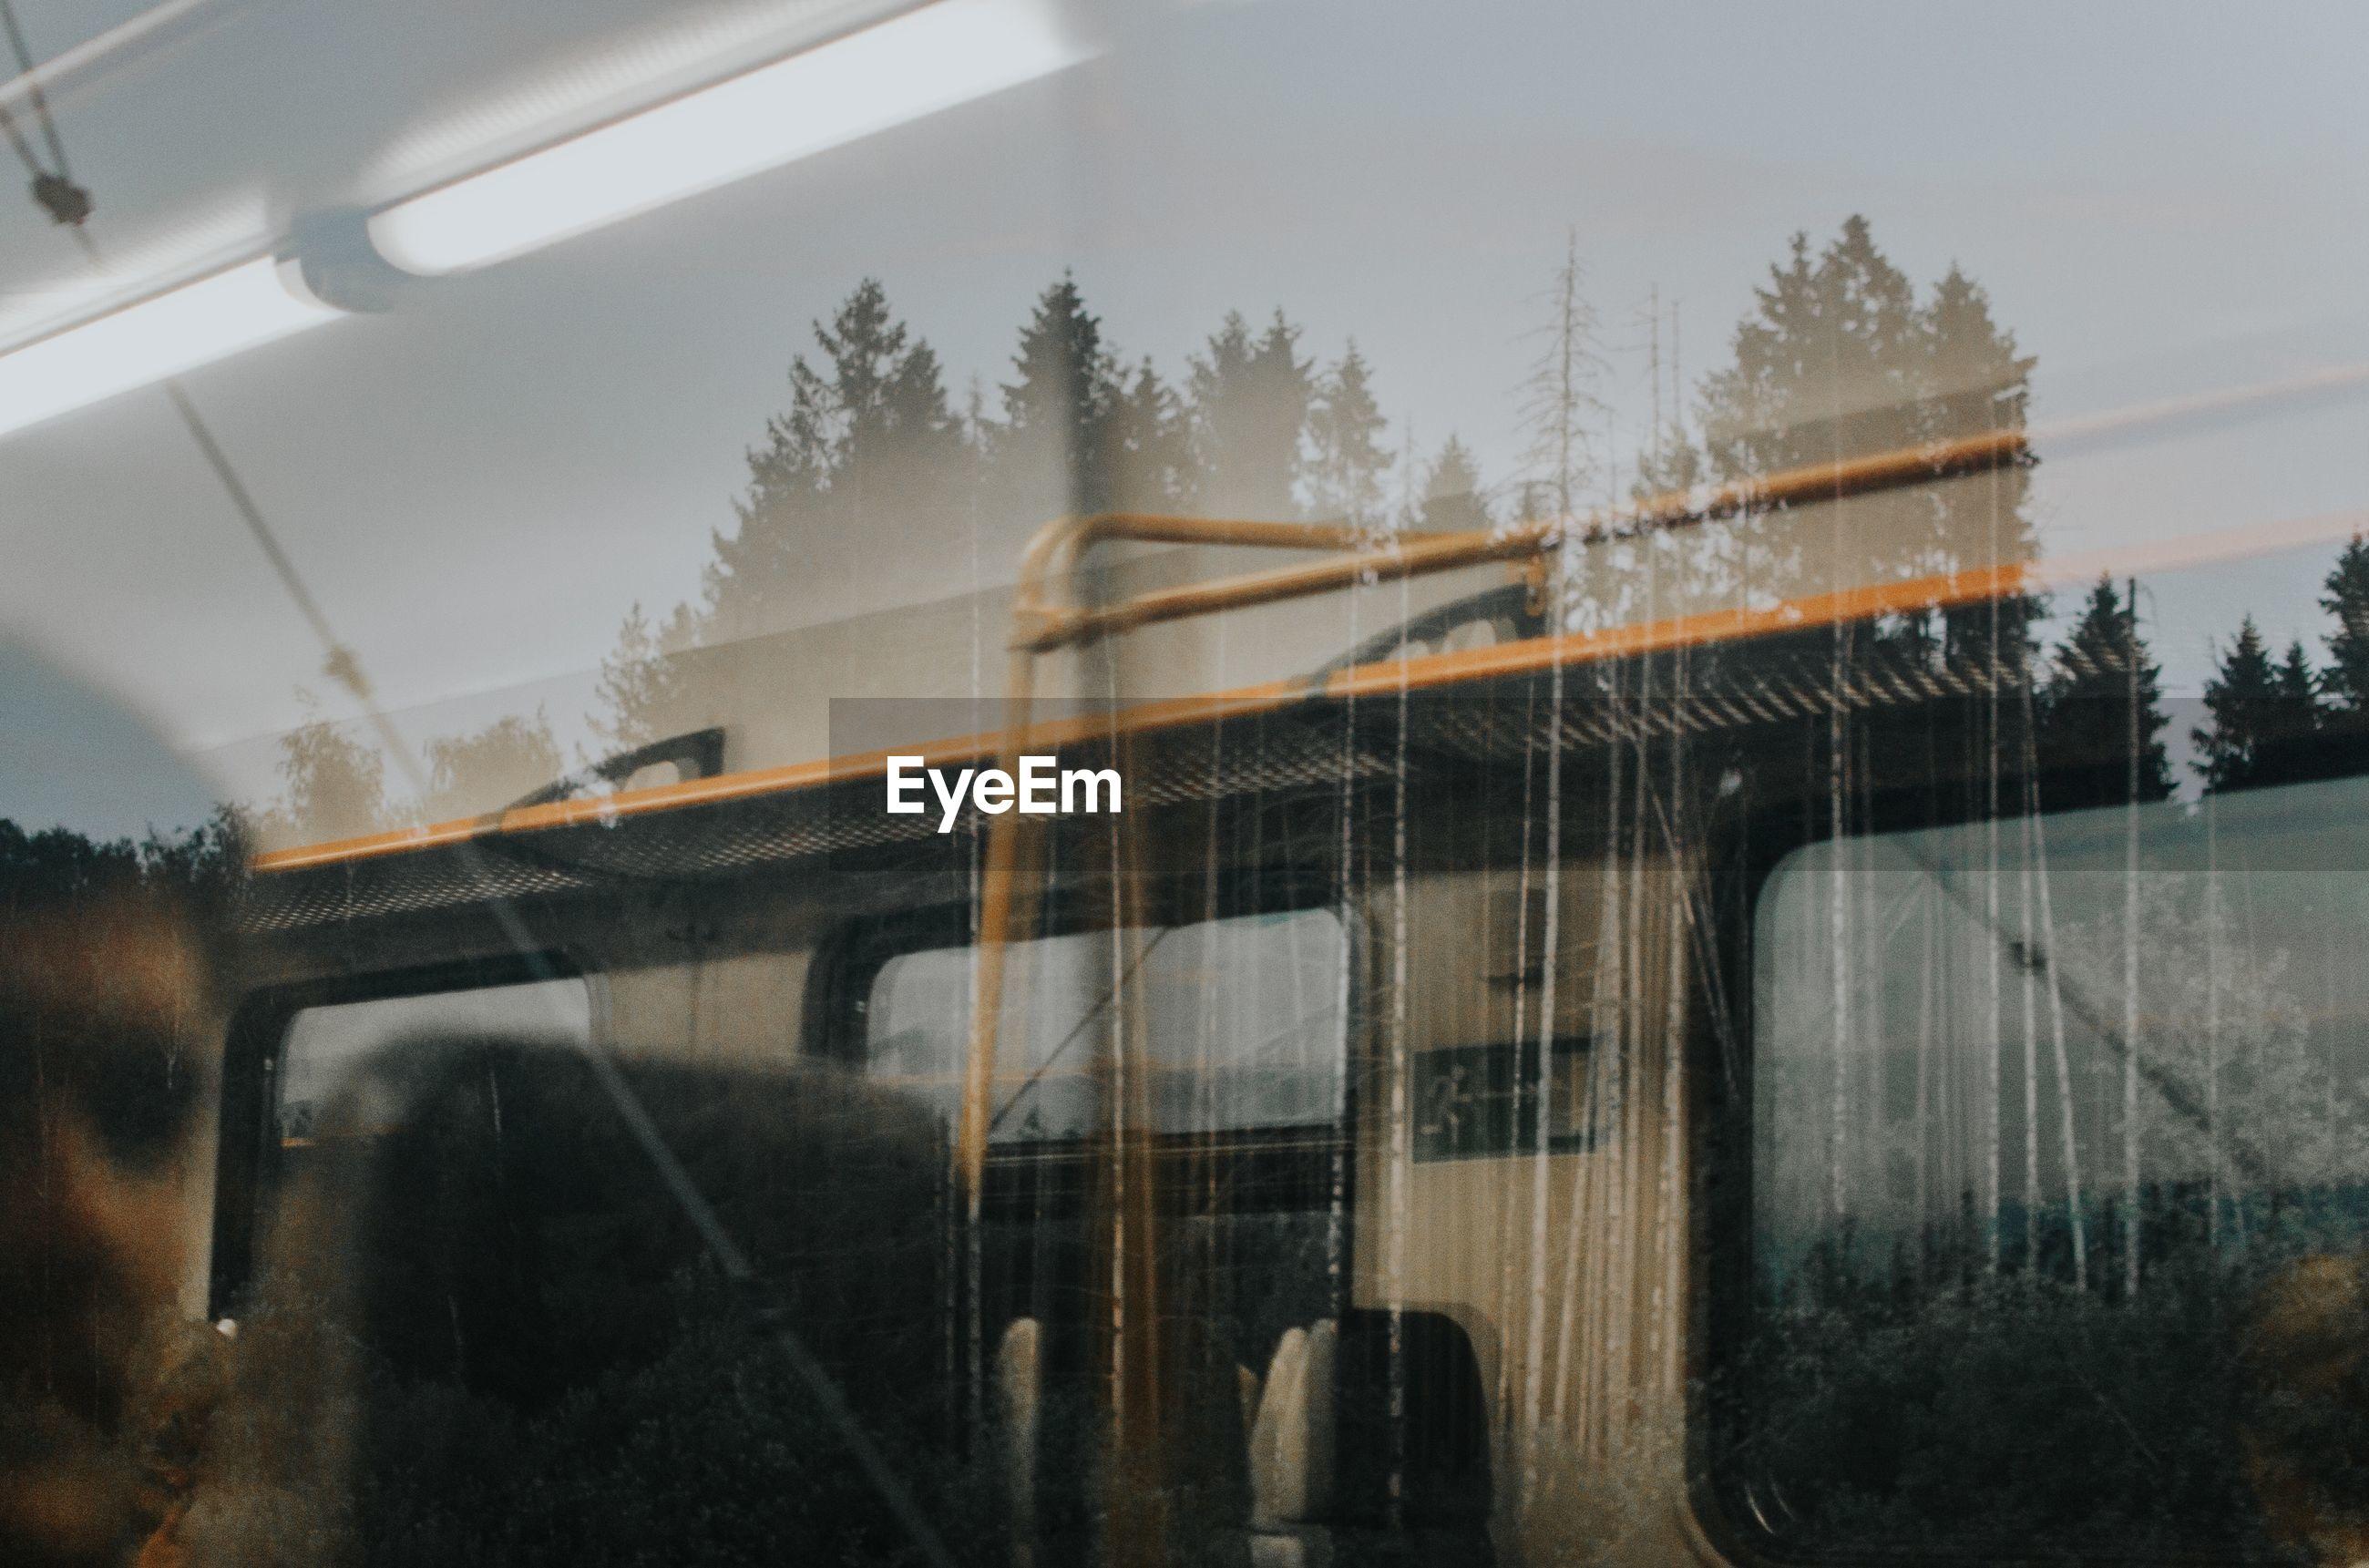 TRAIN ON RAILROAD TRACK SEEN THROUGH WINDSHIELD